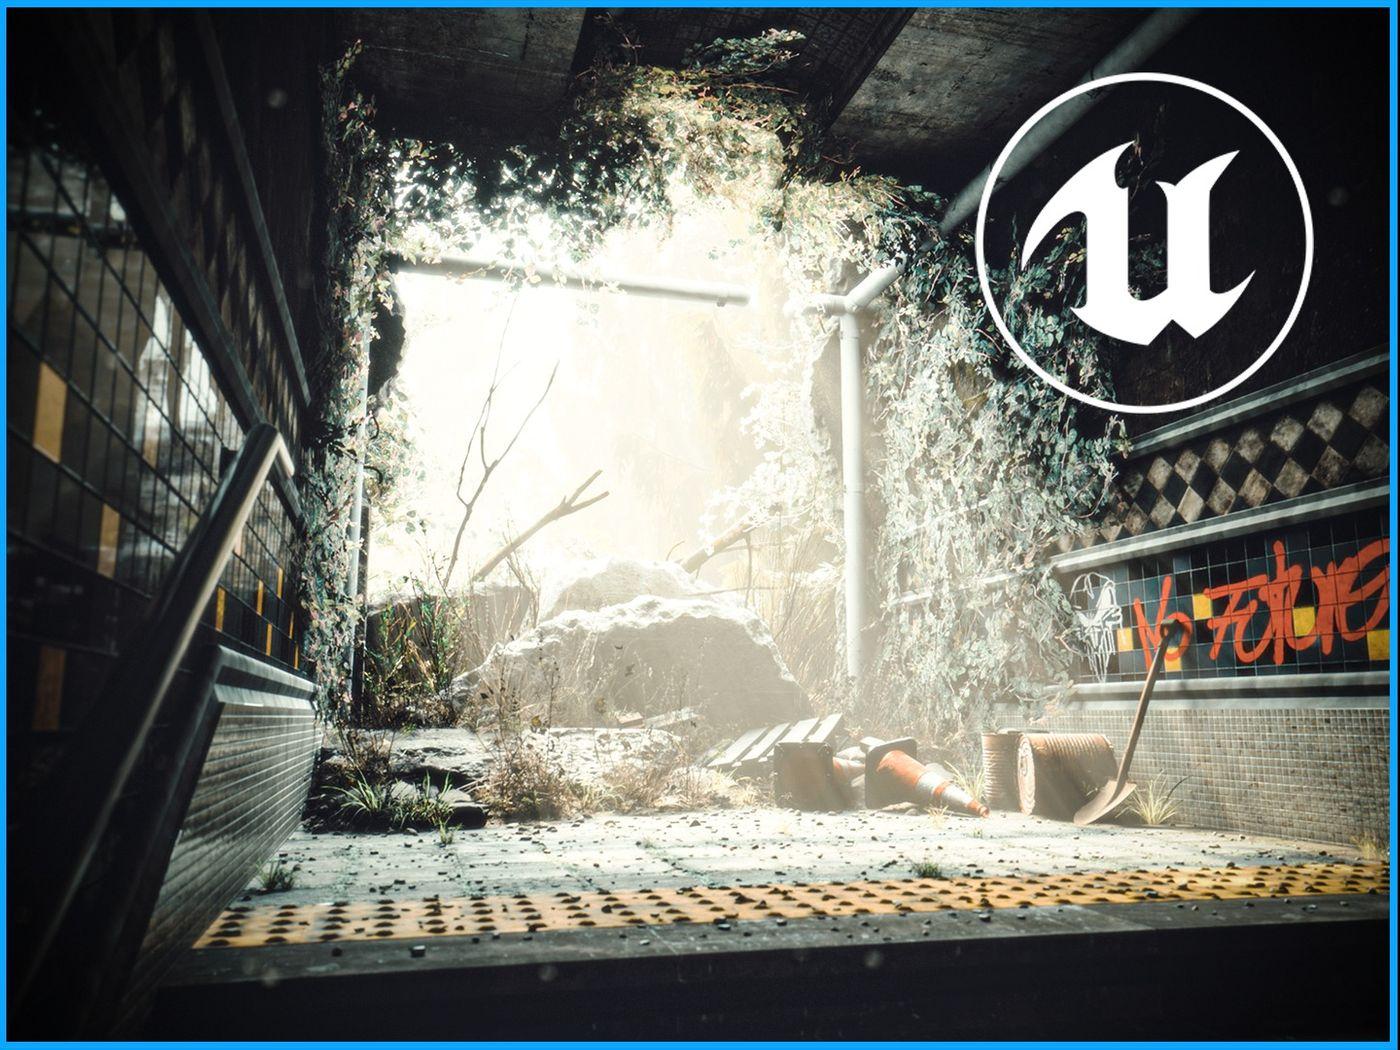 Subway 2041 & Italian alley - Unreal Engine environments